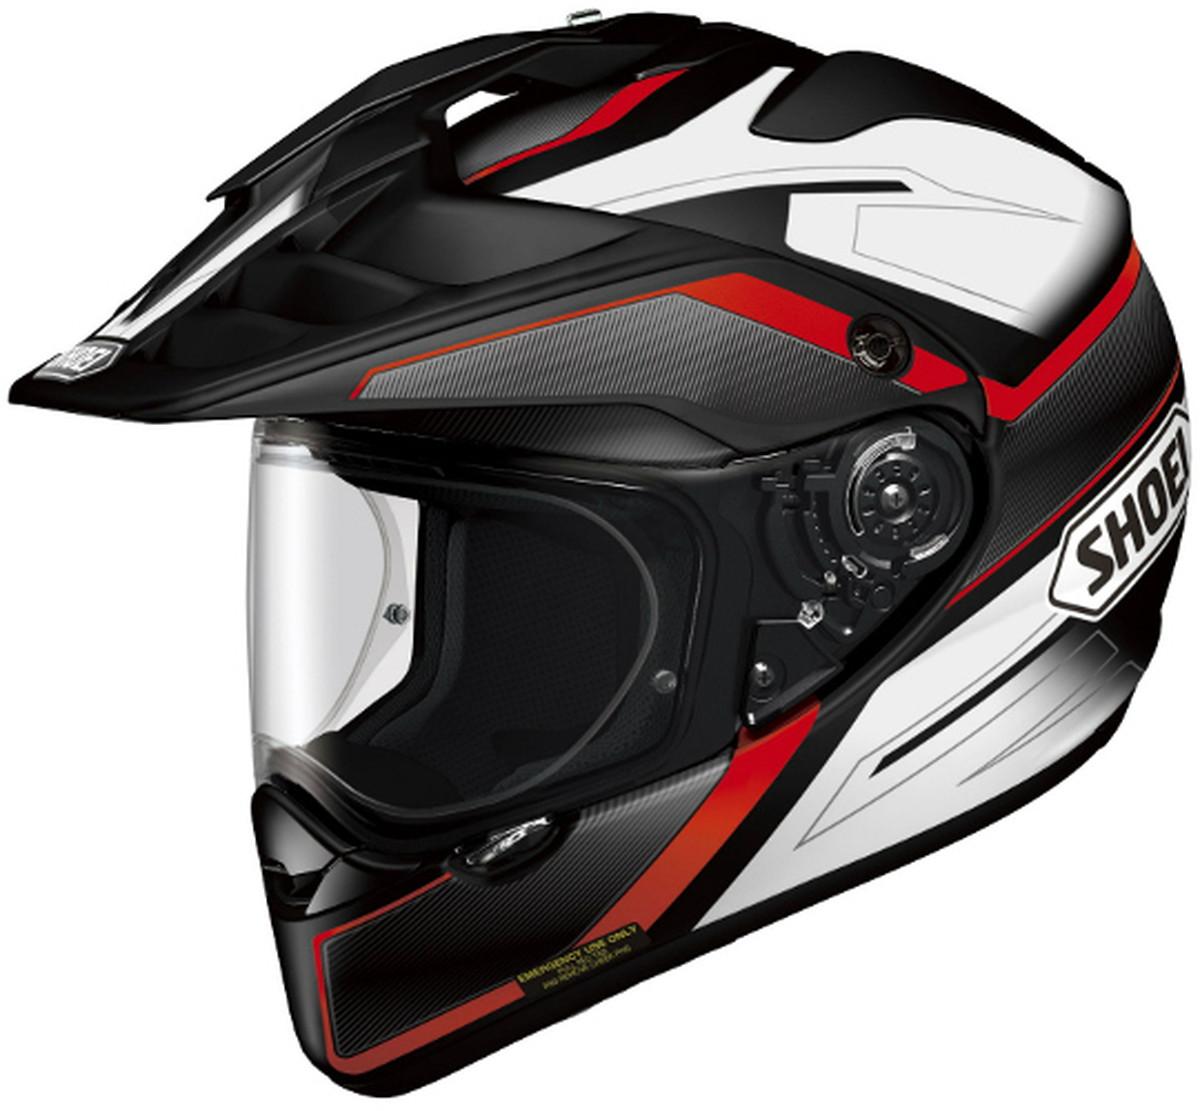 SHOEI オフロードヘルメット HORNET ADV SEEKER TC-1 RD/BK XXLサイズ